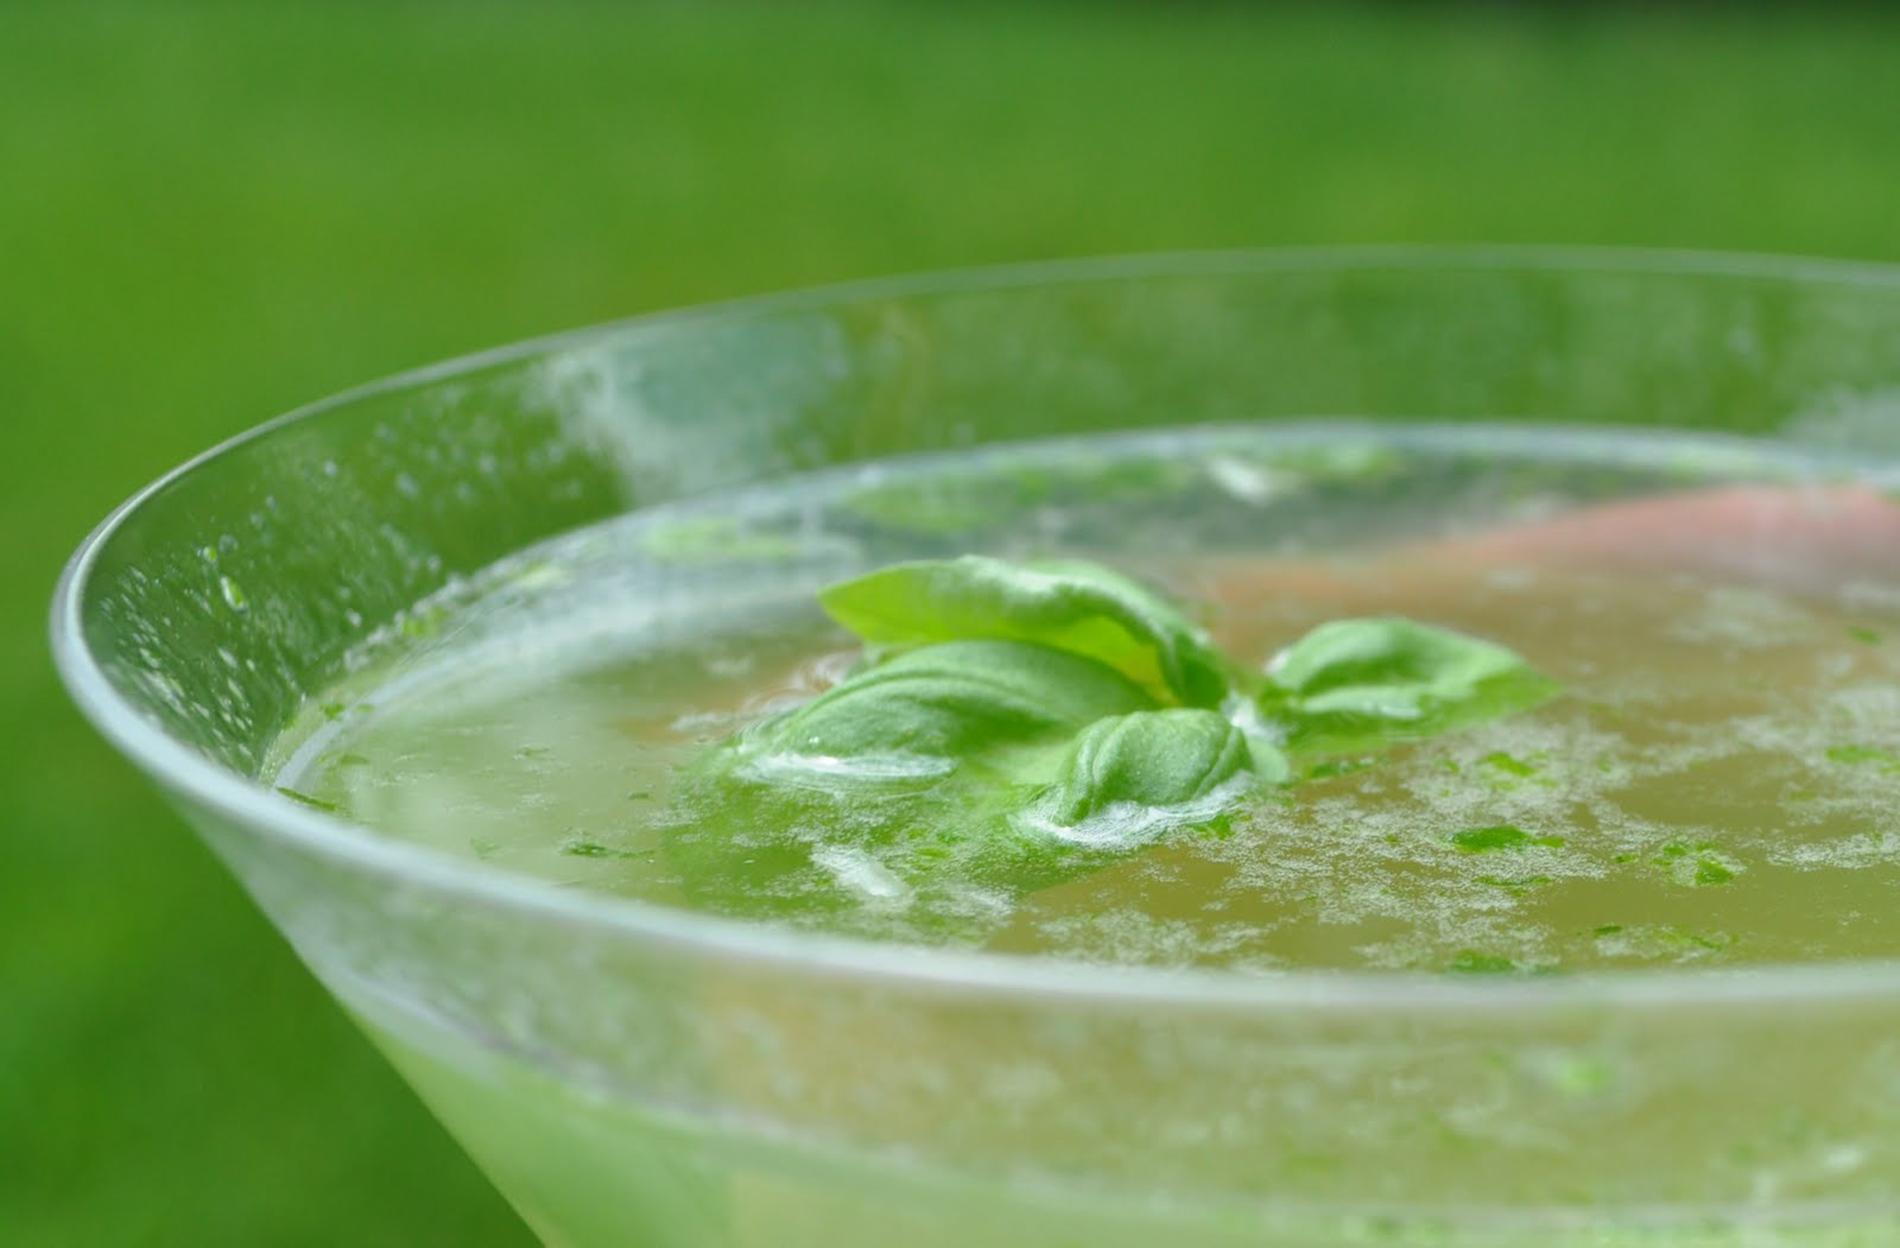 TGIF with a Lemon Basil Martini